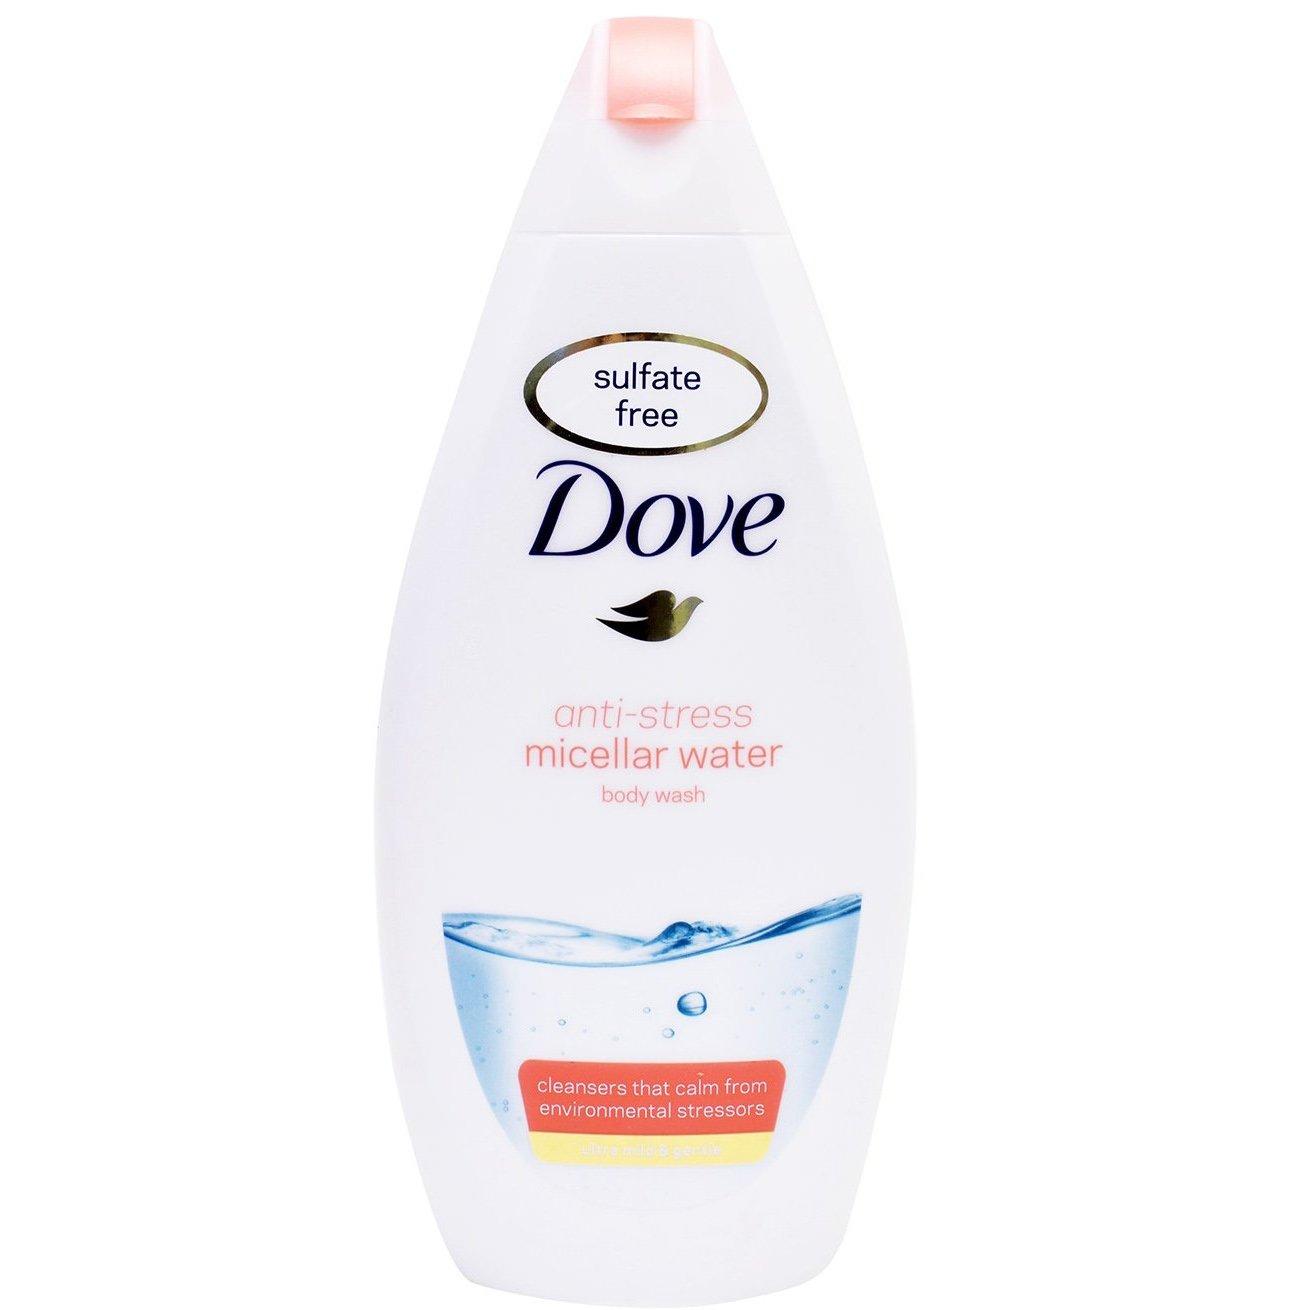 Dove Anti-Stress Micellar Water Body Wash Ήπιο, Απαλό Αφρόλουτρο με Anti-Stress Δράση 500ml